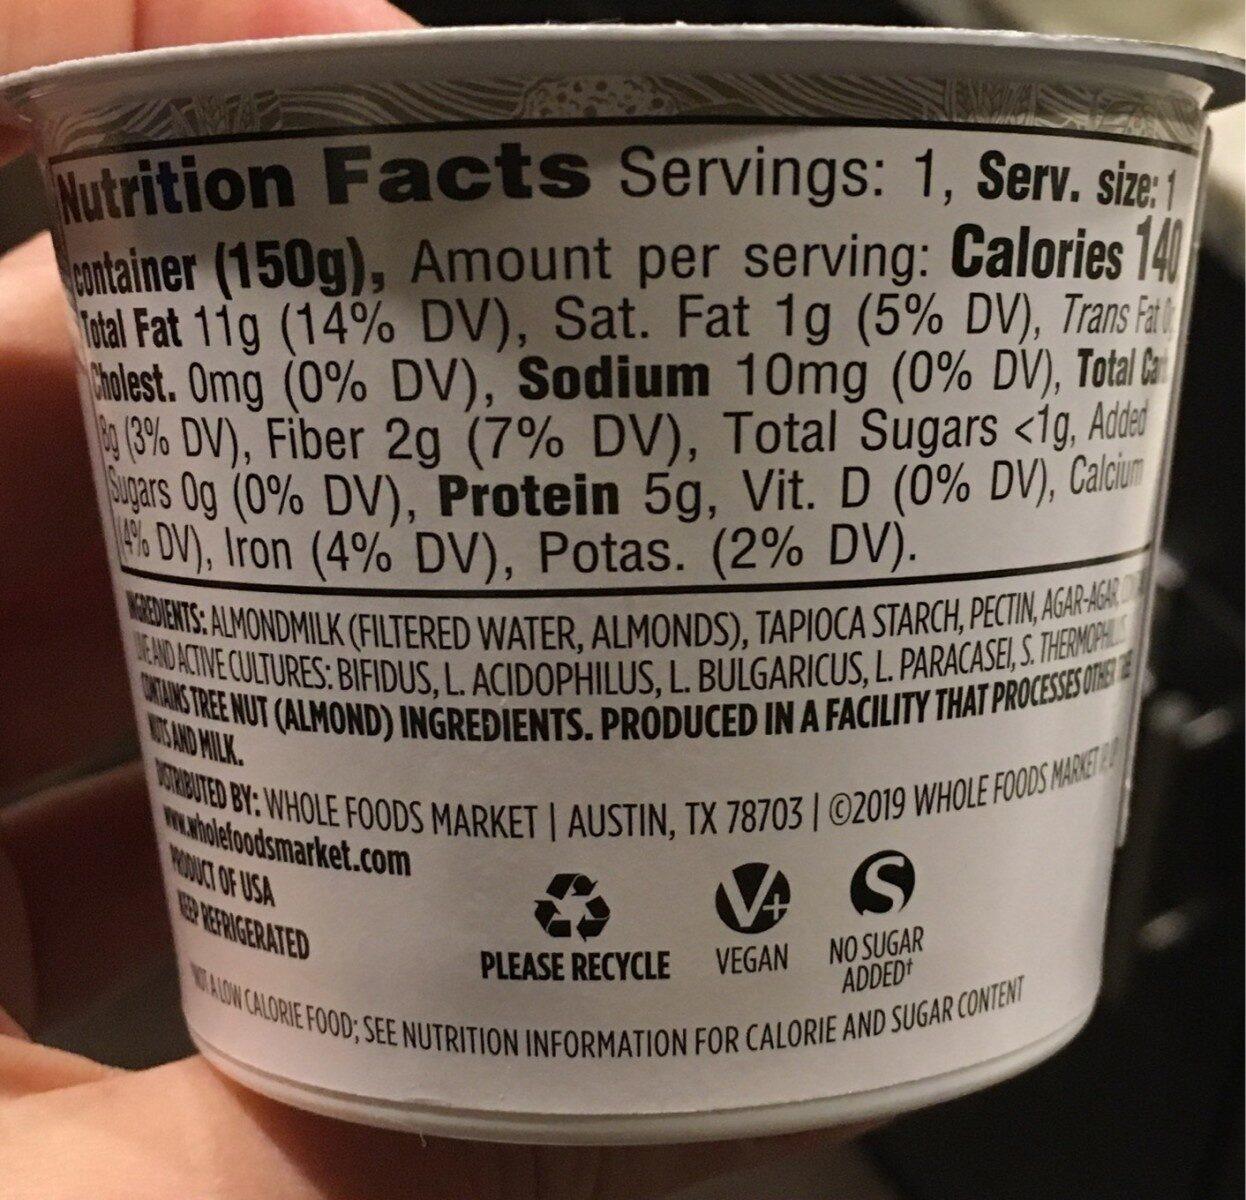 Plain almondmilk unsweetened non-dairy yogurt, plain almondmilk - Informations nutritionnelles - fr